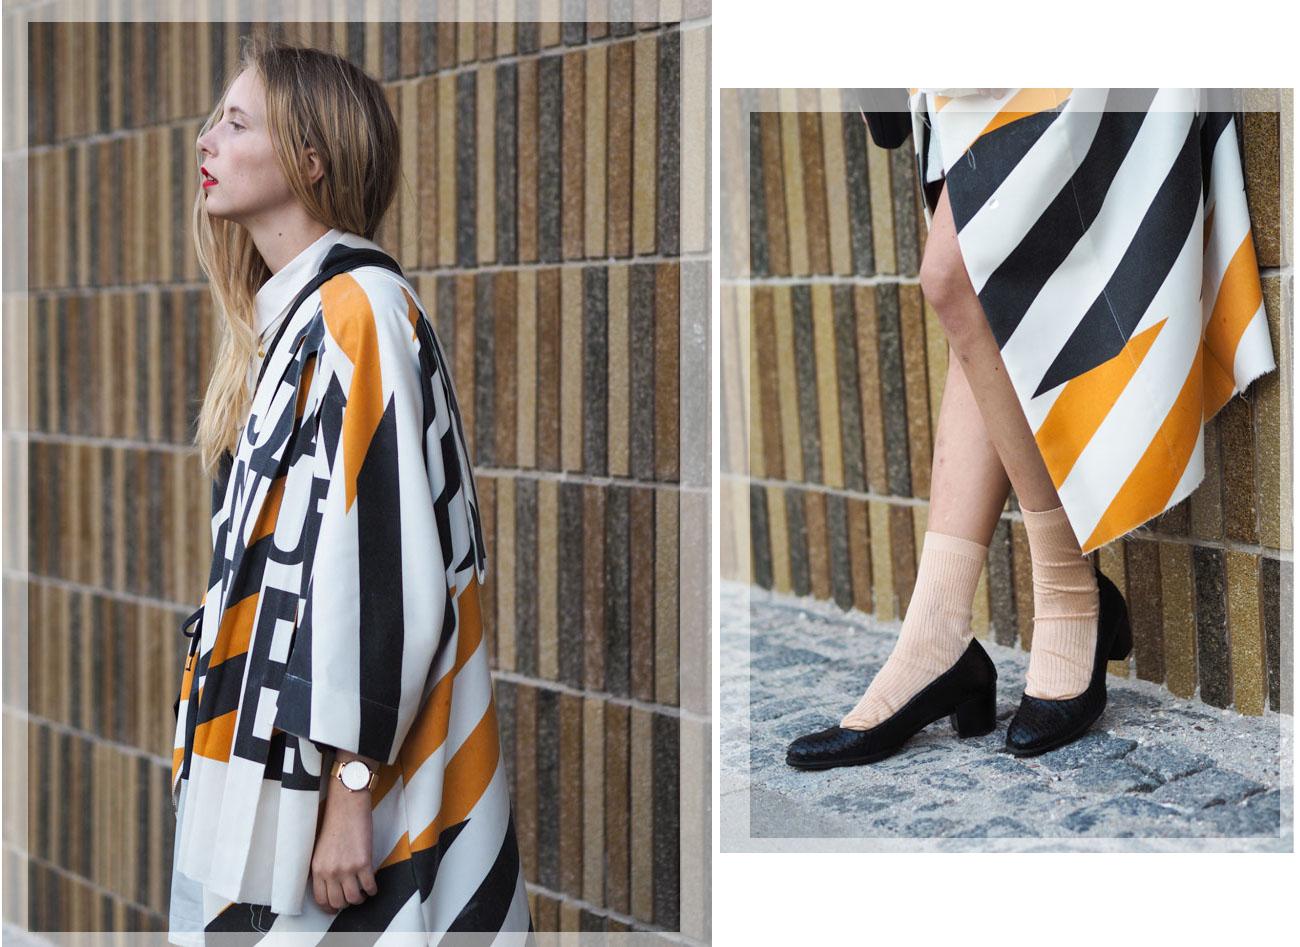 outfit june 16 nemesis babe marie my jensen danish blogger fashion week henrik vibskov-6coll4